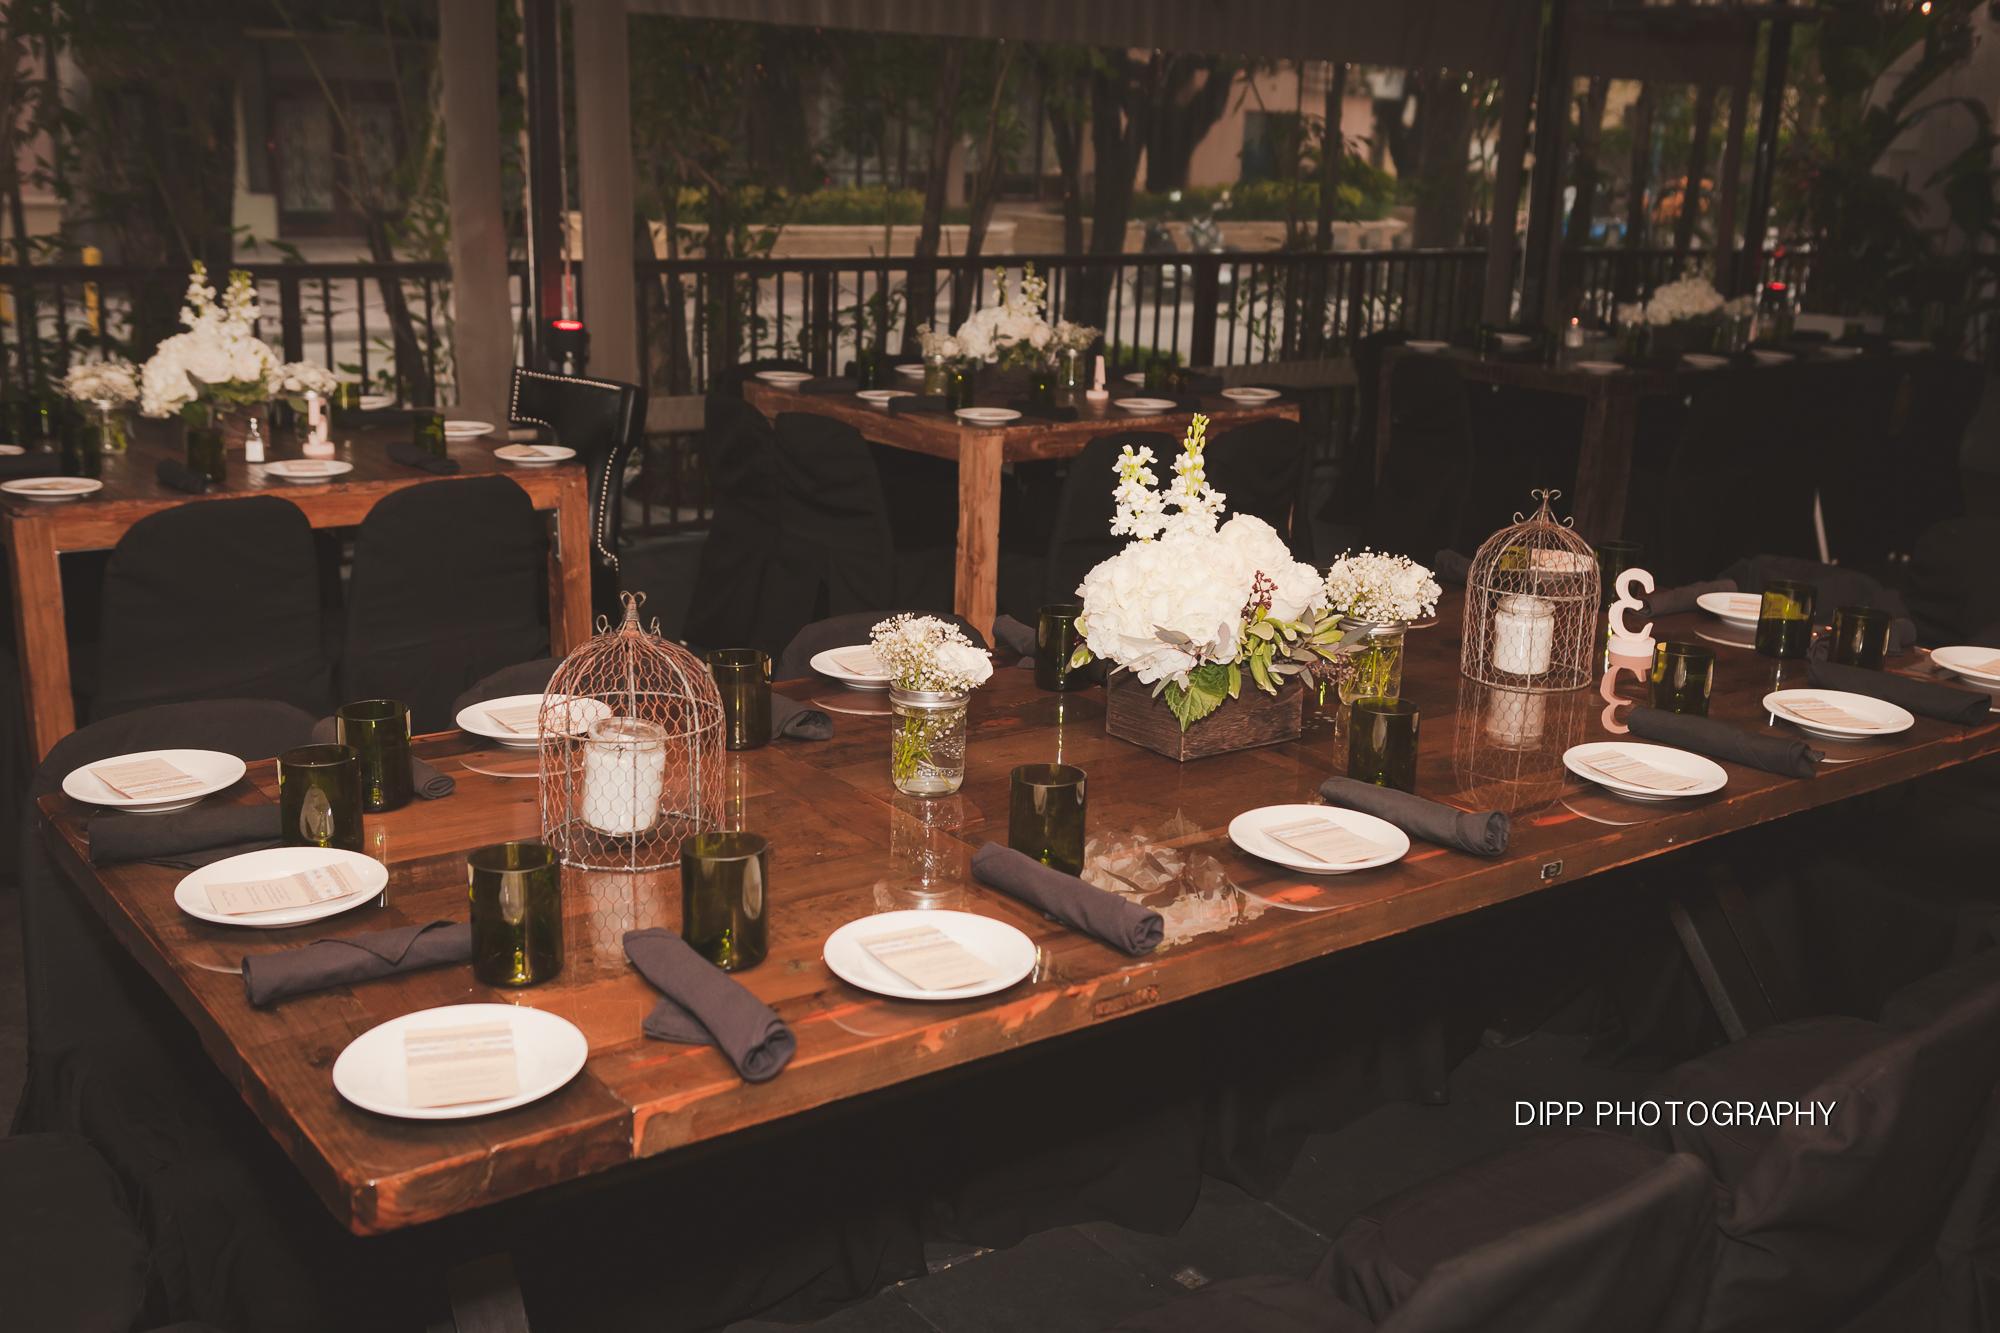 Dipp_2016 EDITED Melissa & Avilio Wedding-384